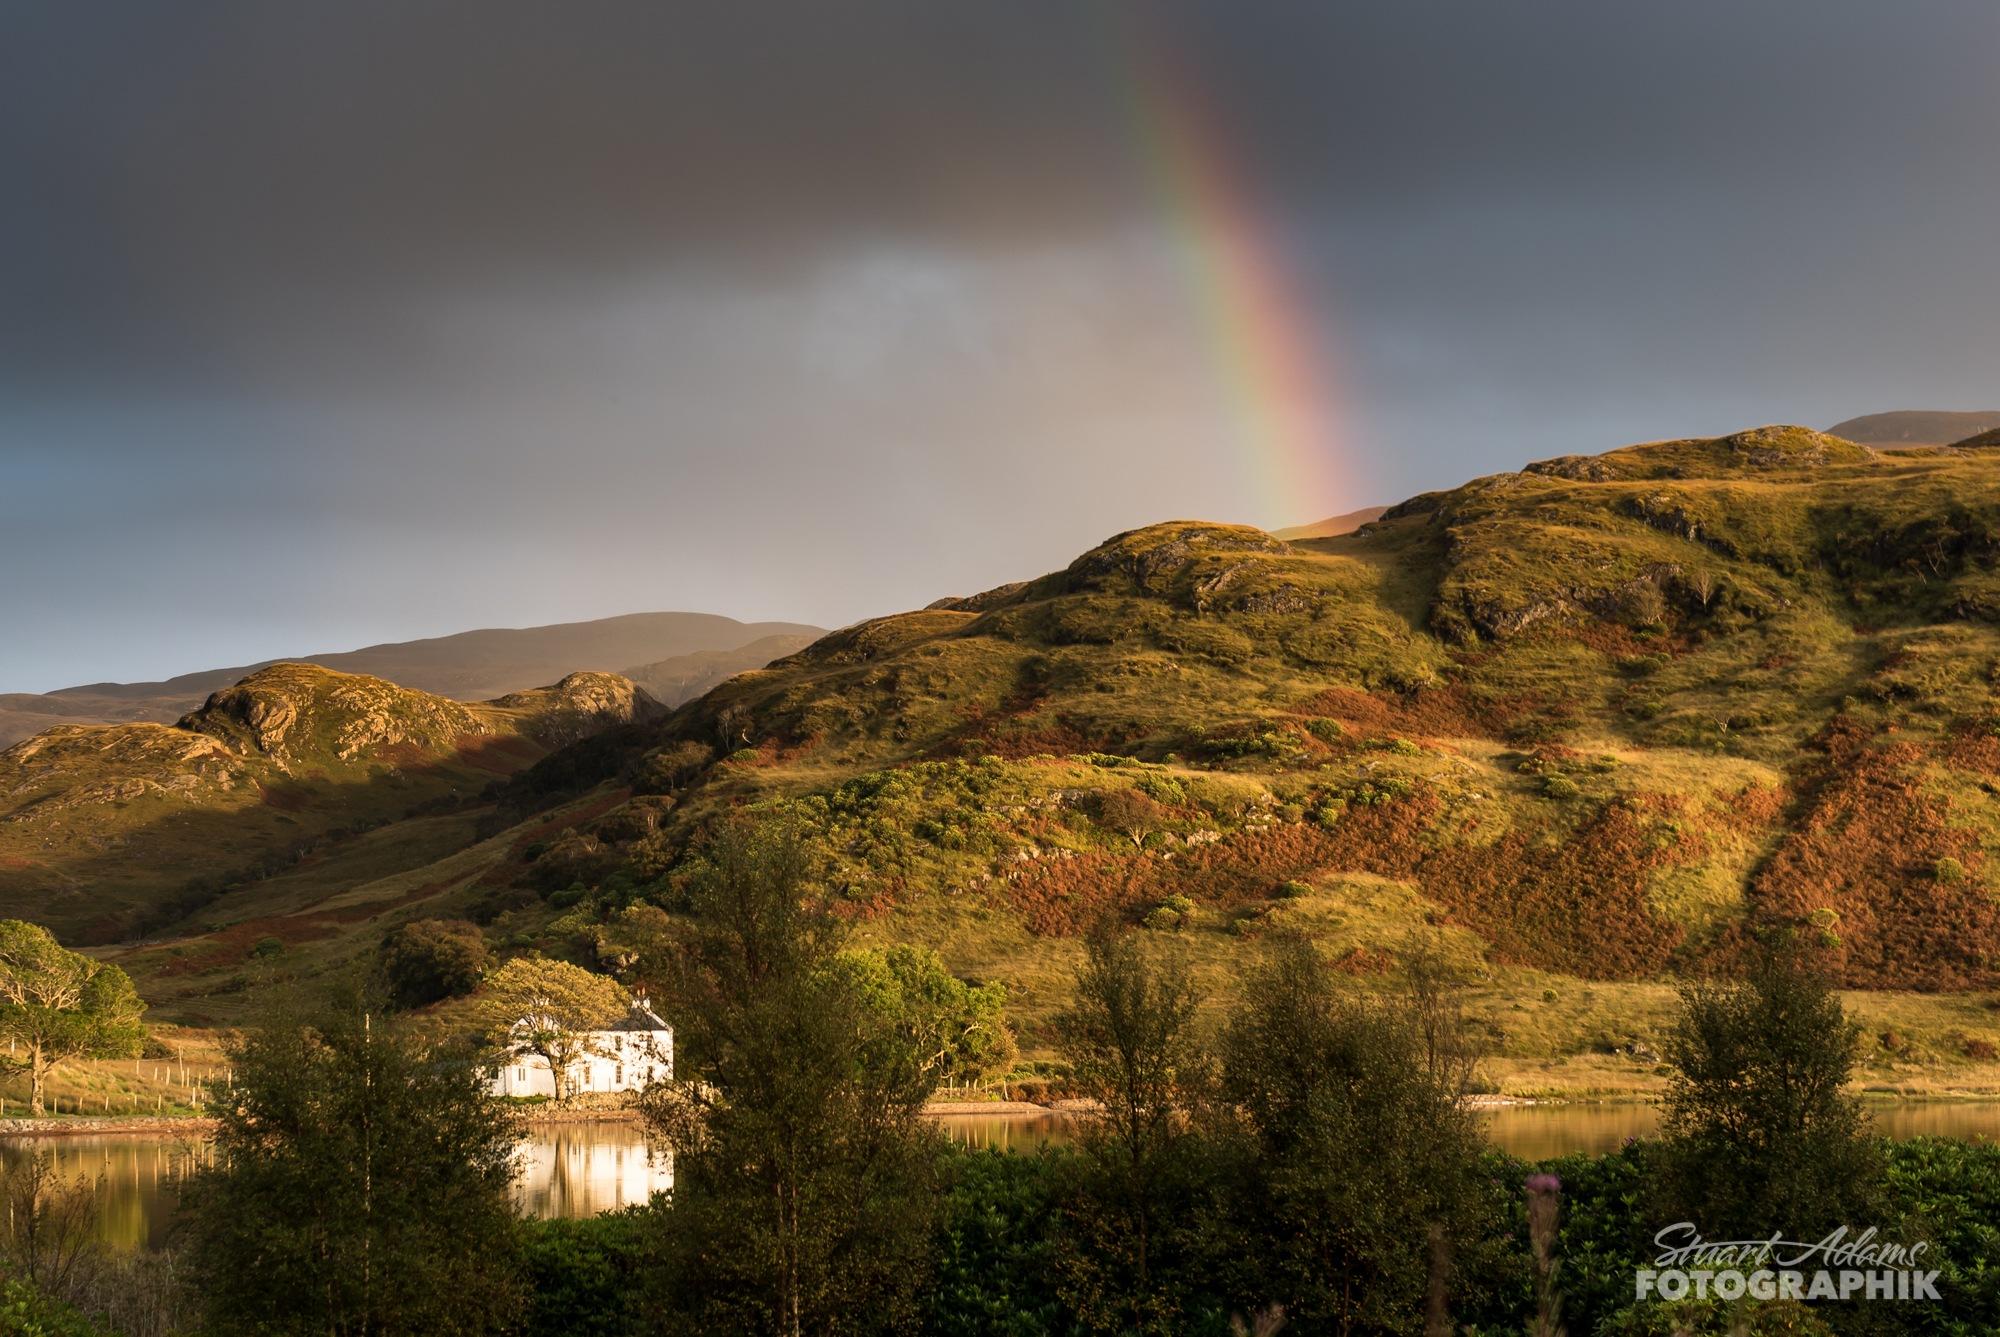 Loch Uisg Rainbow by Stuart Adams Fotographik